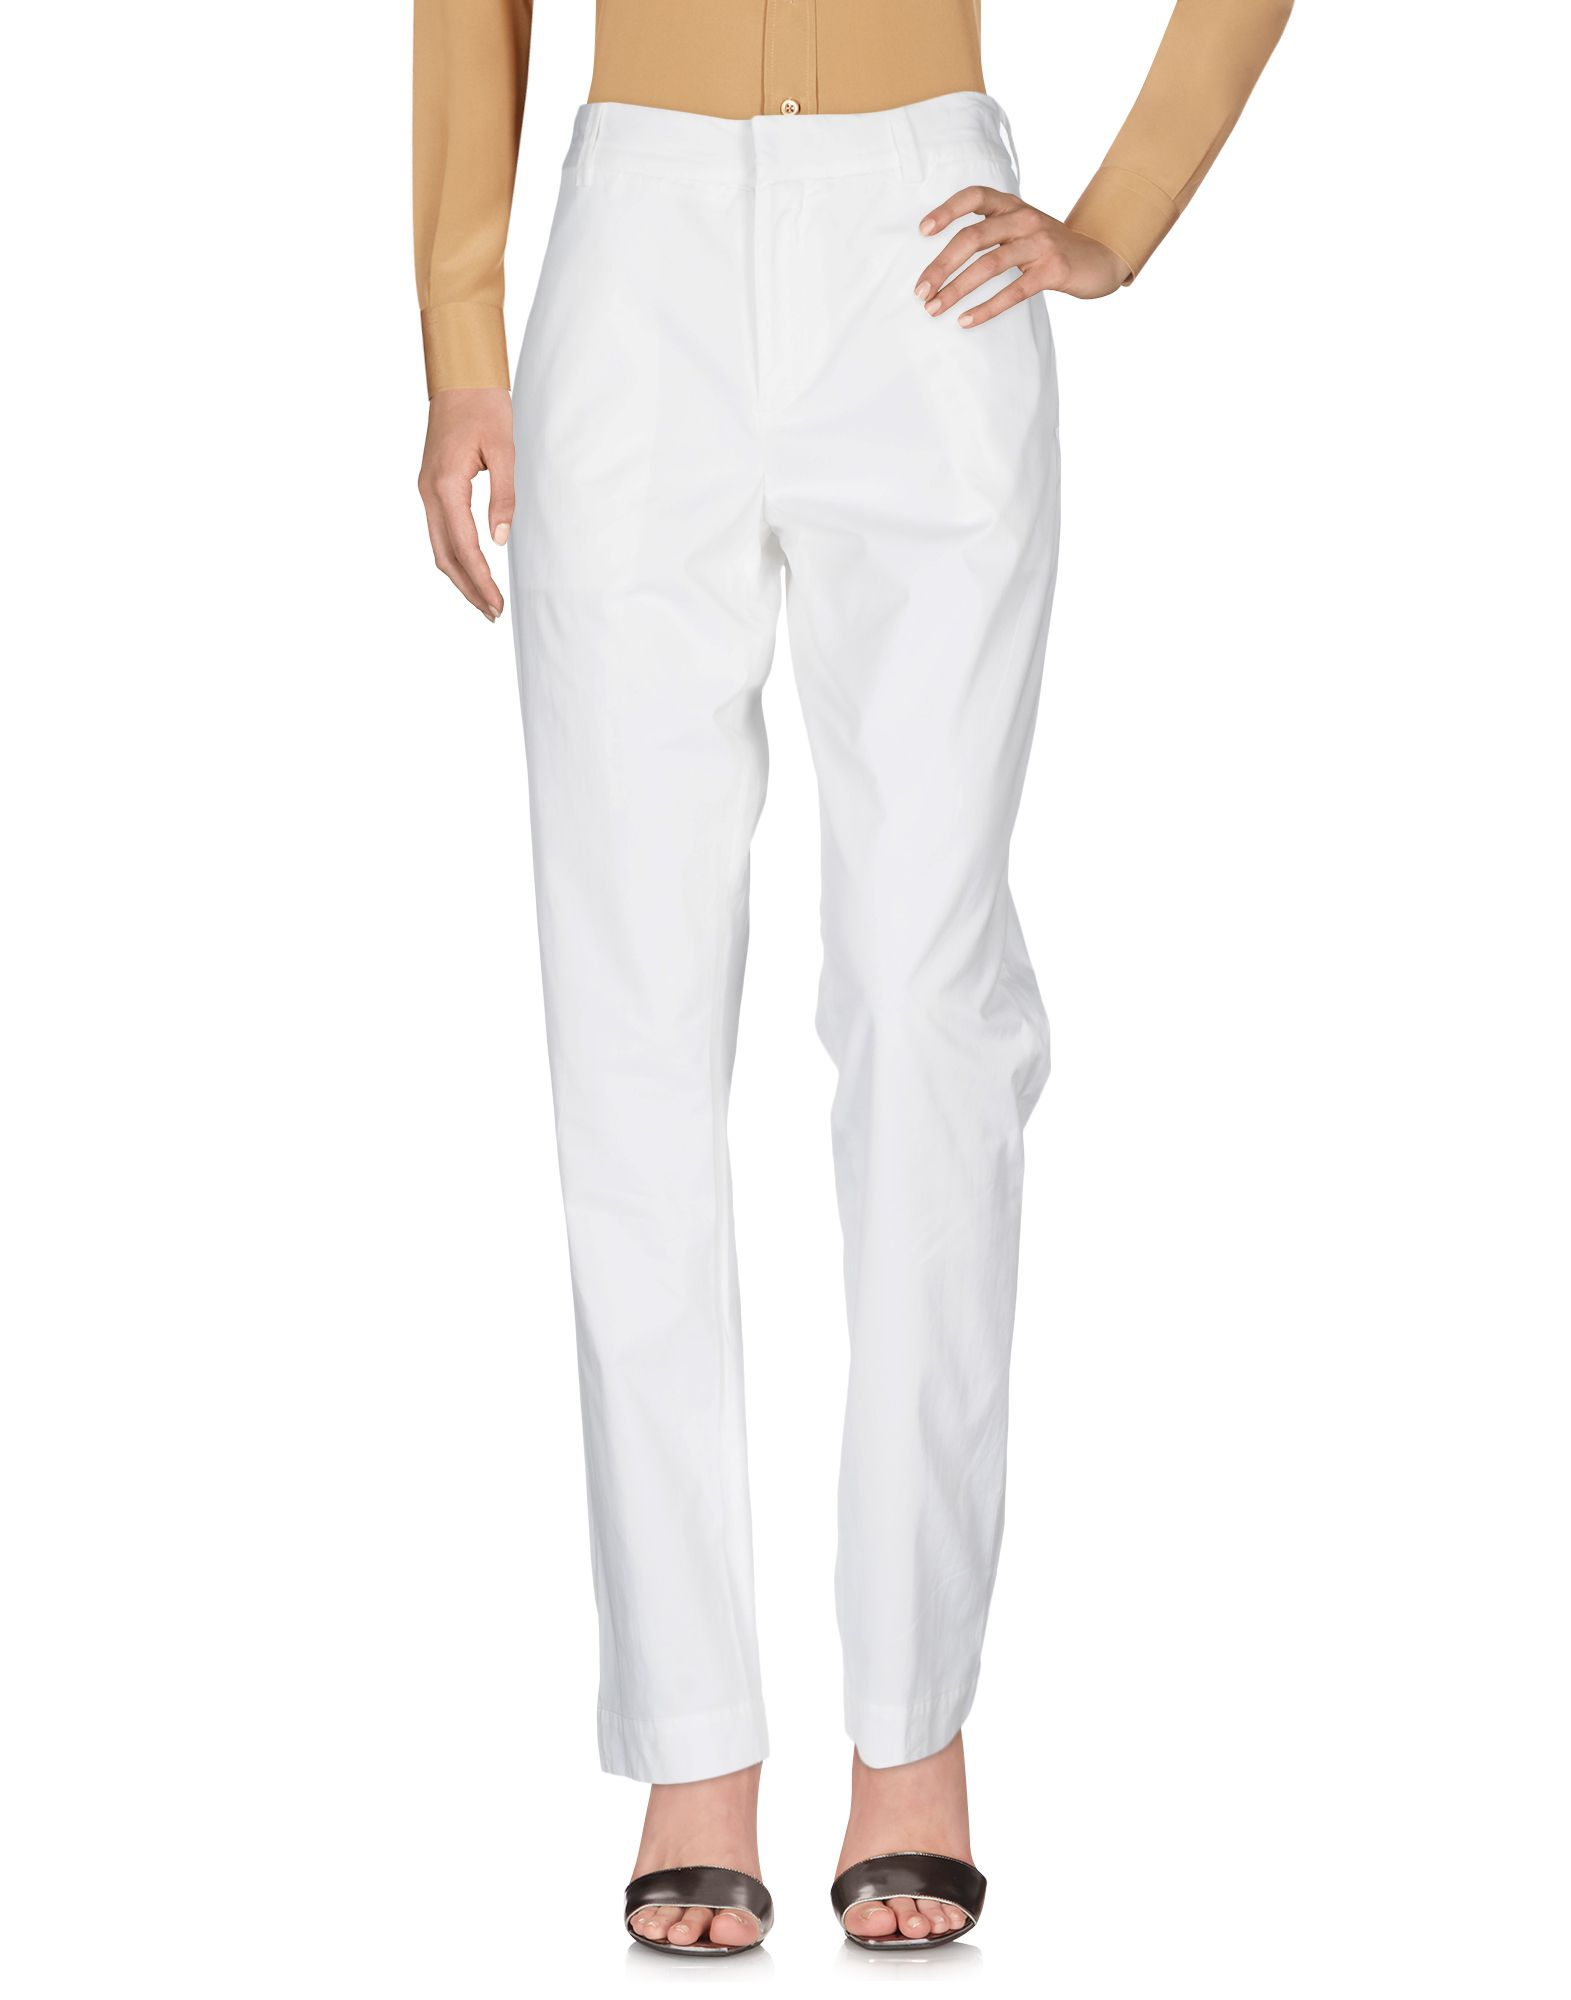 Pantalone Marni Donna - Acquista online su NGDDO6wZY